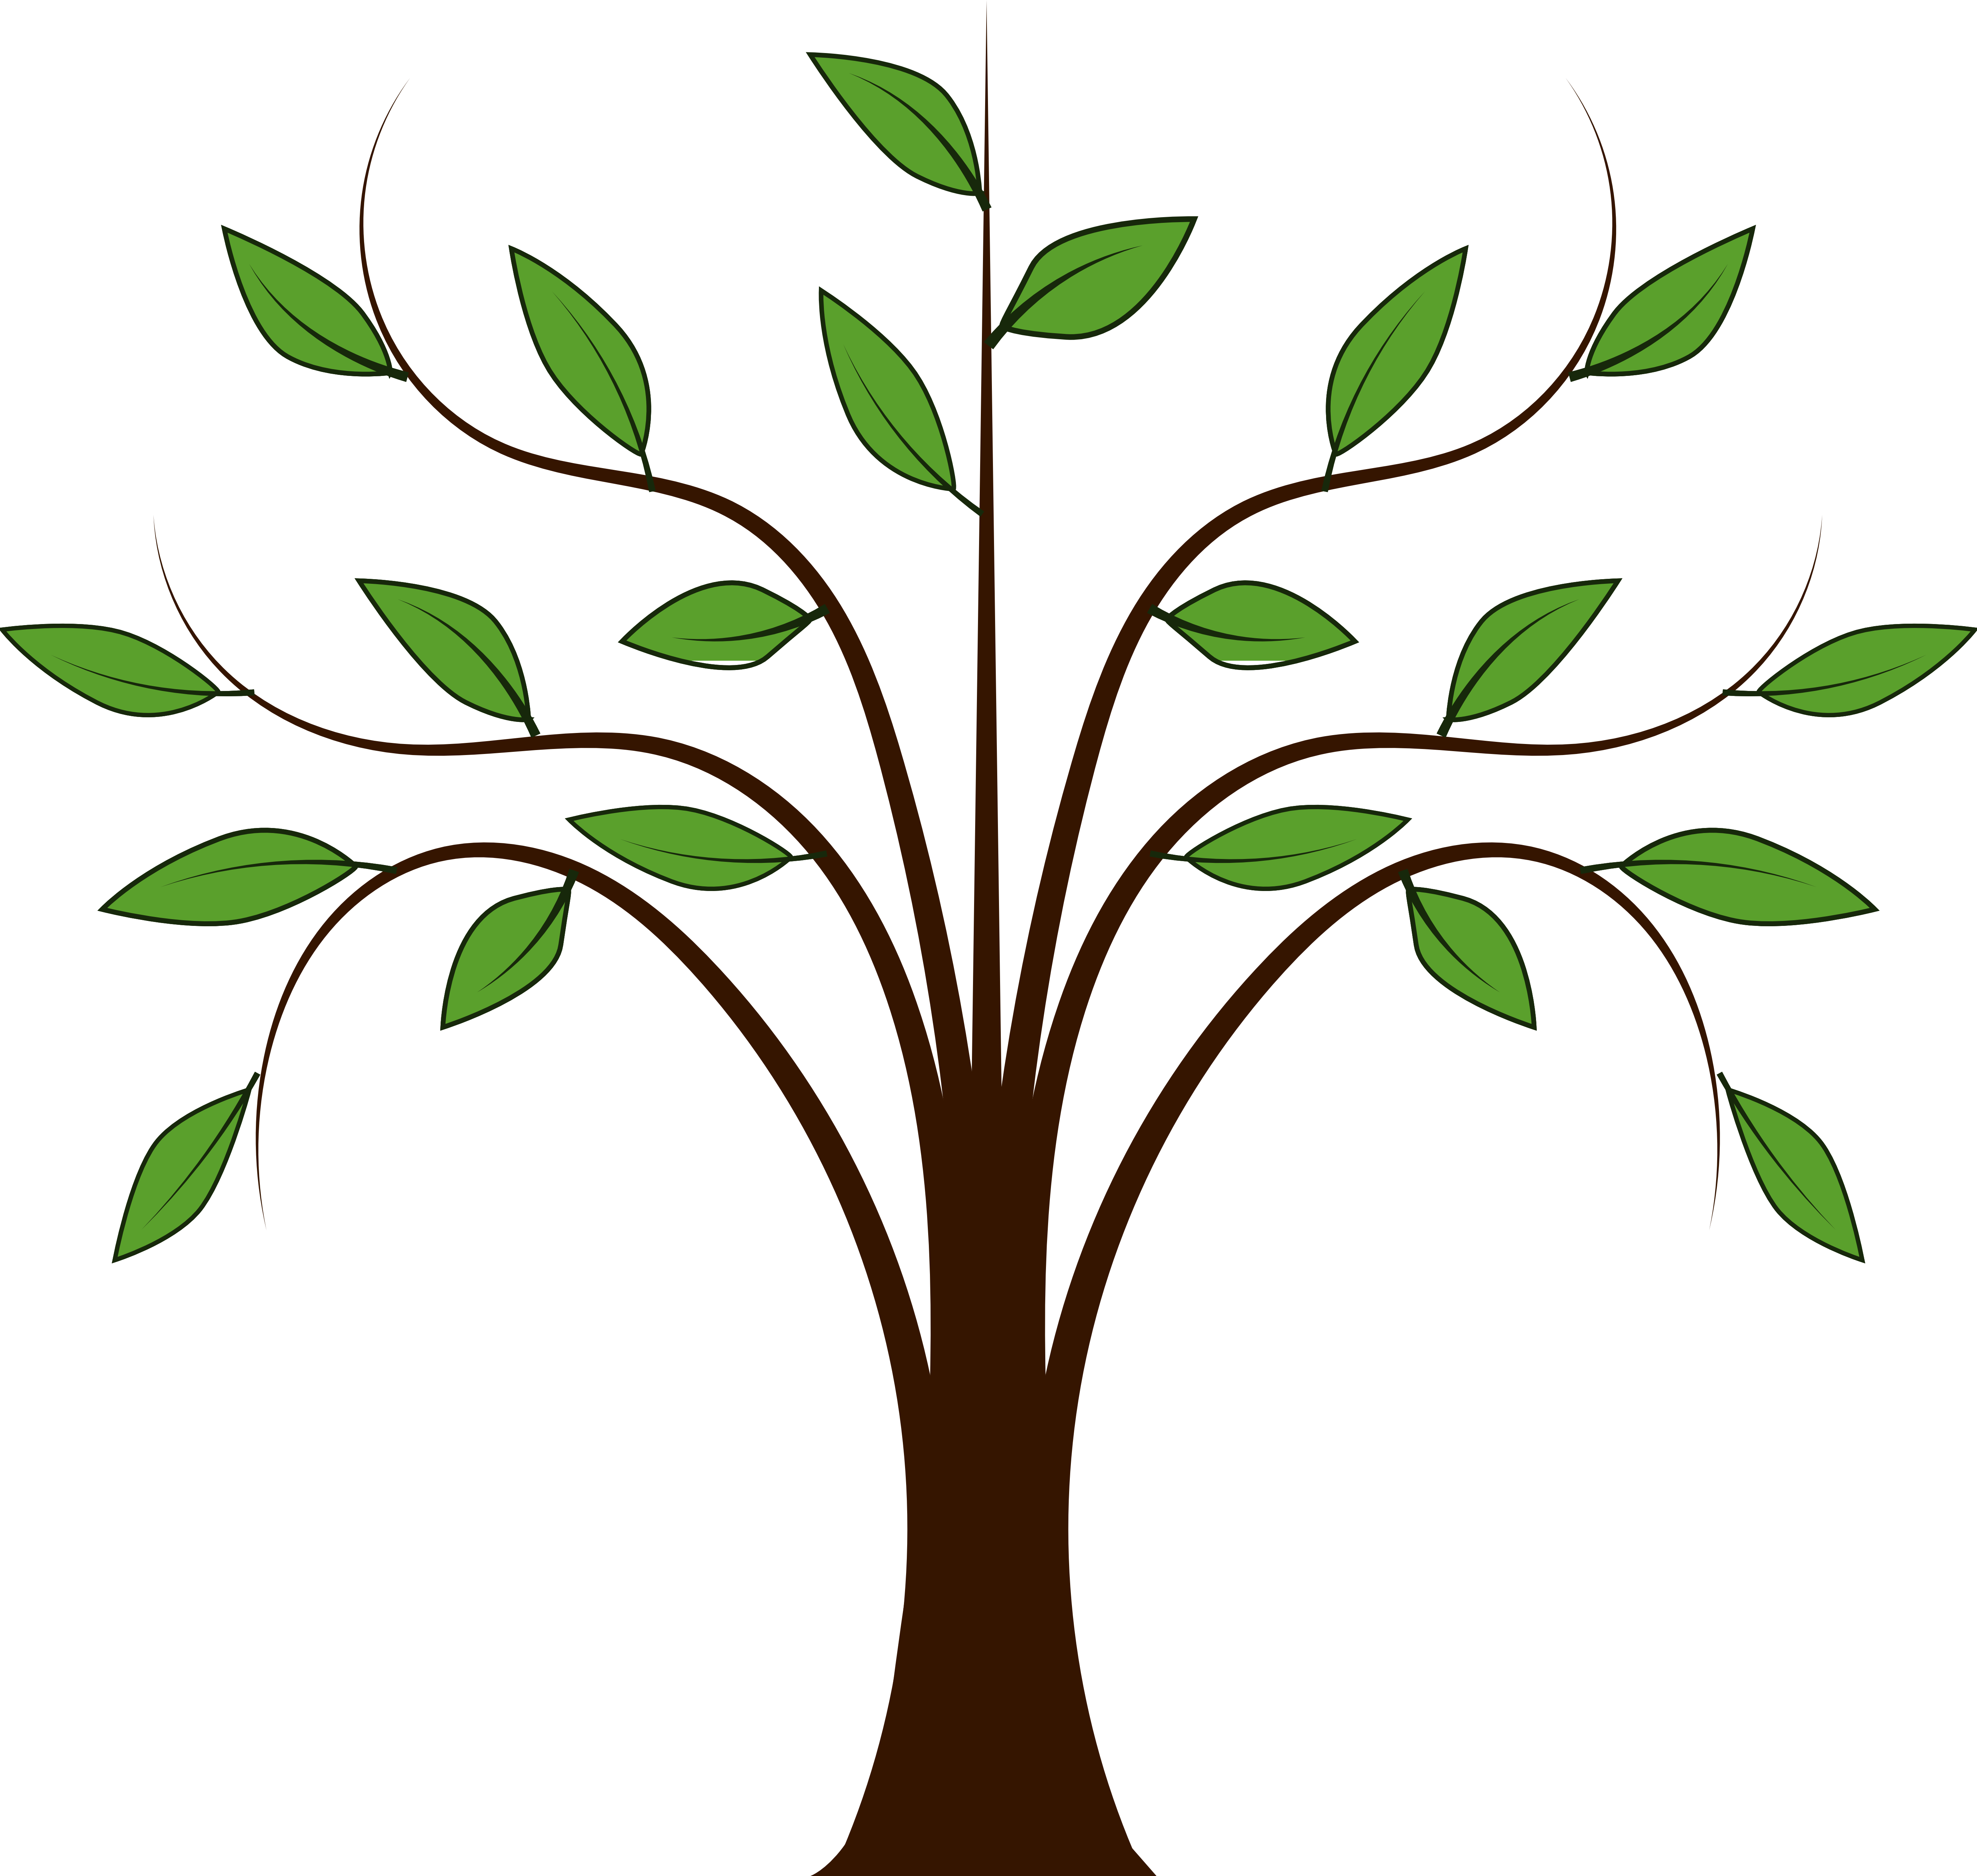 clipart downloads u0026middot; clipart family u0026middot; clipart tree